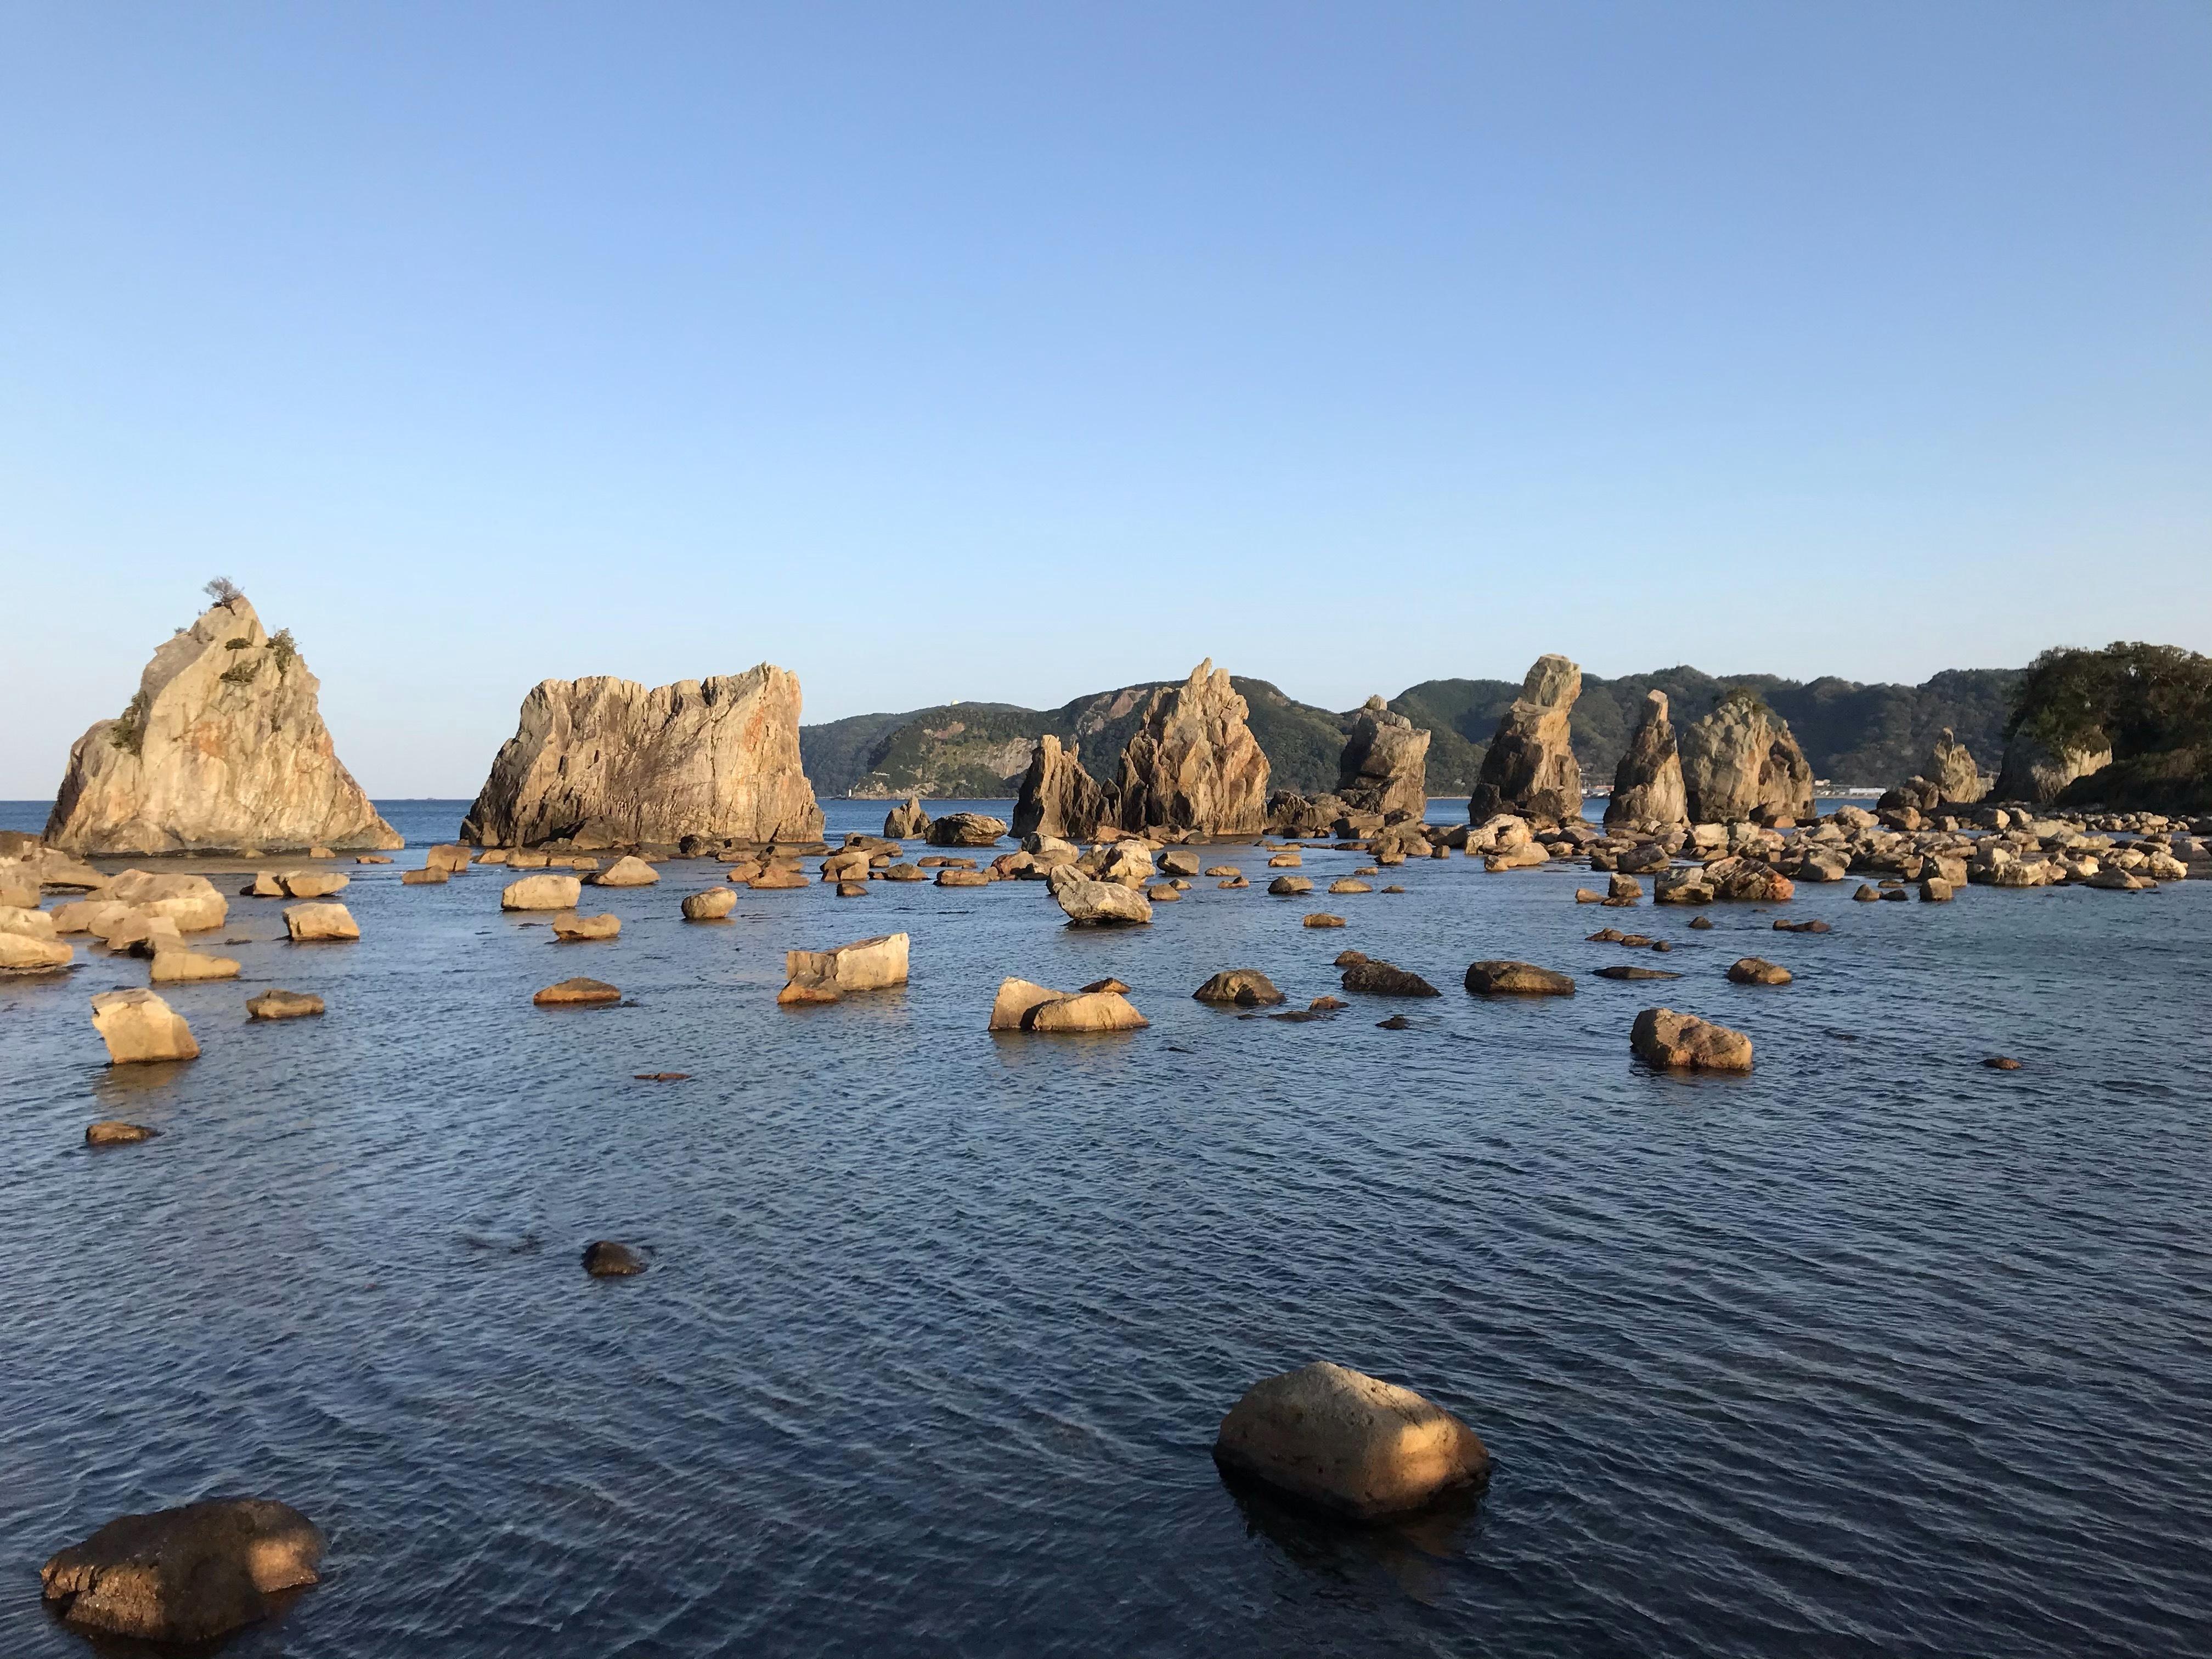 harleydavidson-motorcycle-touring-wakayama-hashiguiiwa-rocks-2.jpg